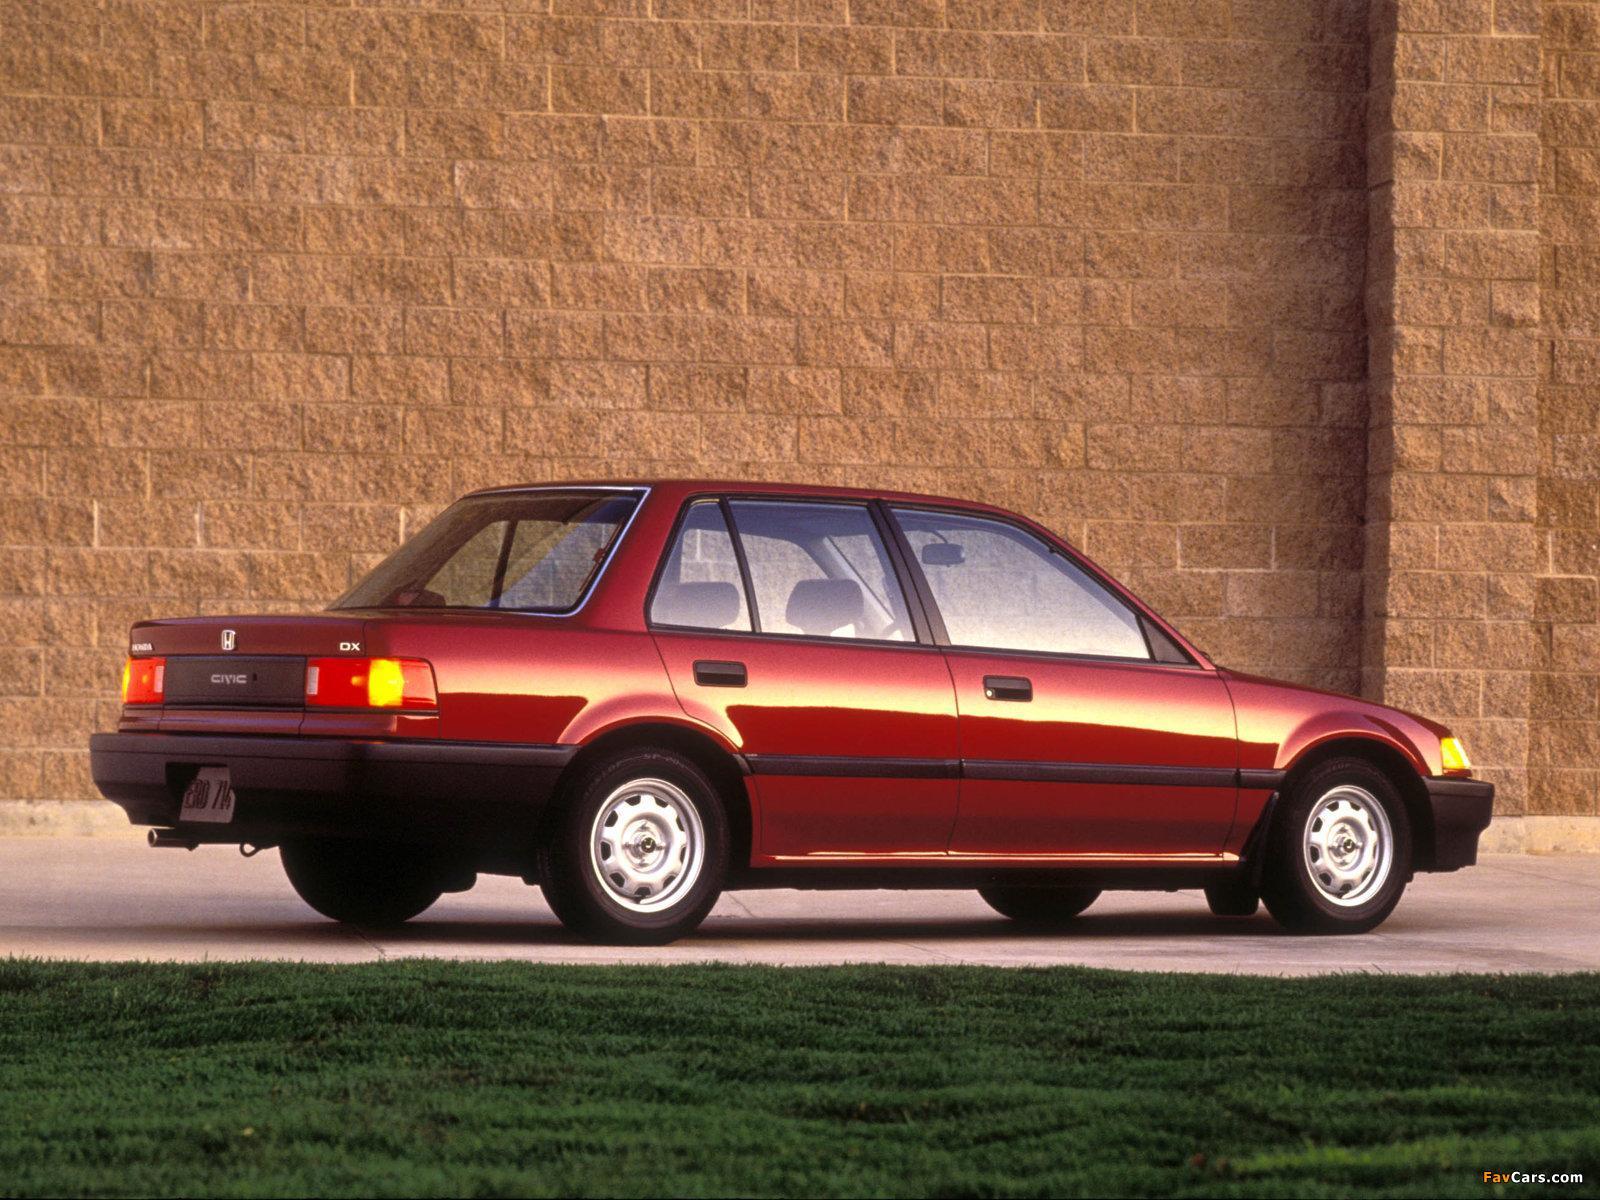 Honda civic sedan us spec ef 1988 91 wallpapers 1600x1200 for Honda civic 1988